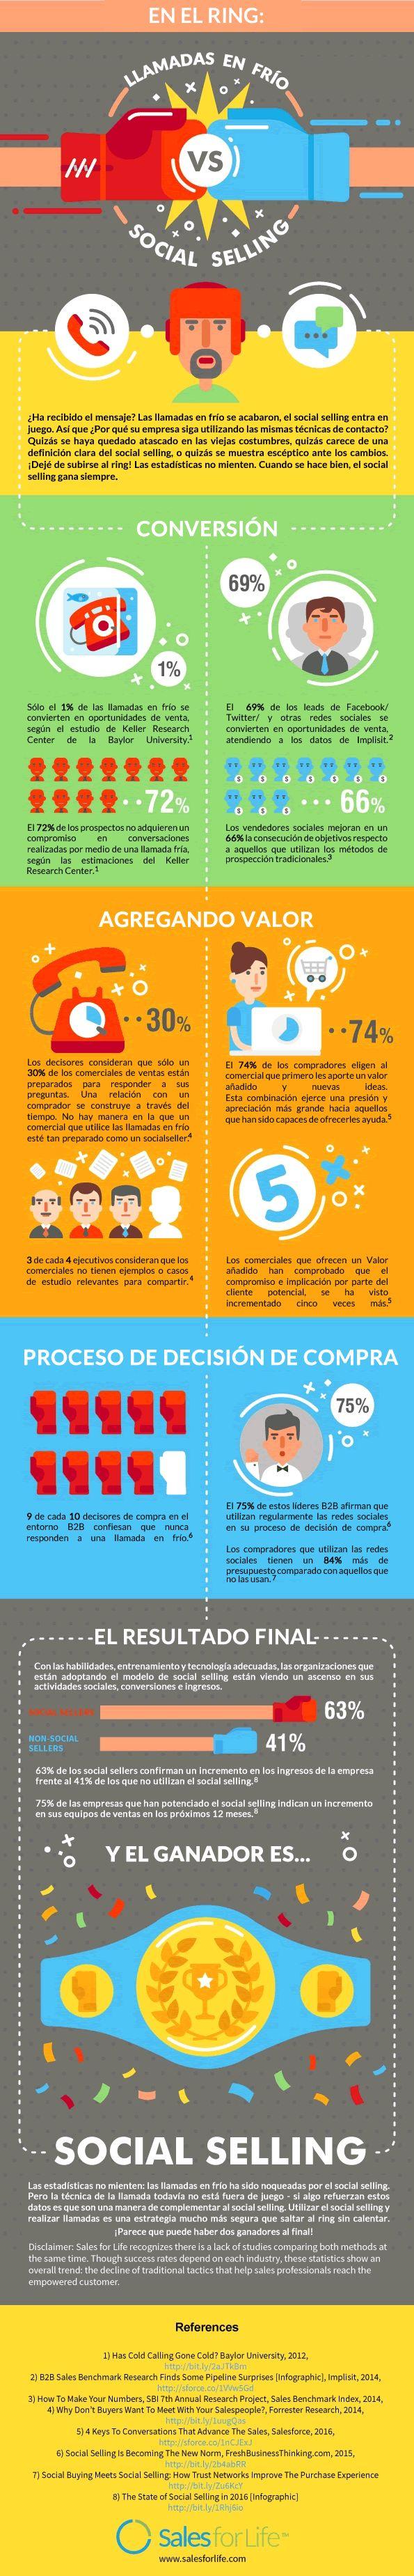 Llamadas en Frío vs Social Selling - Kompass México